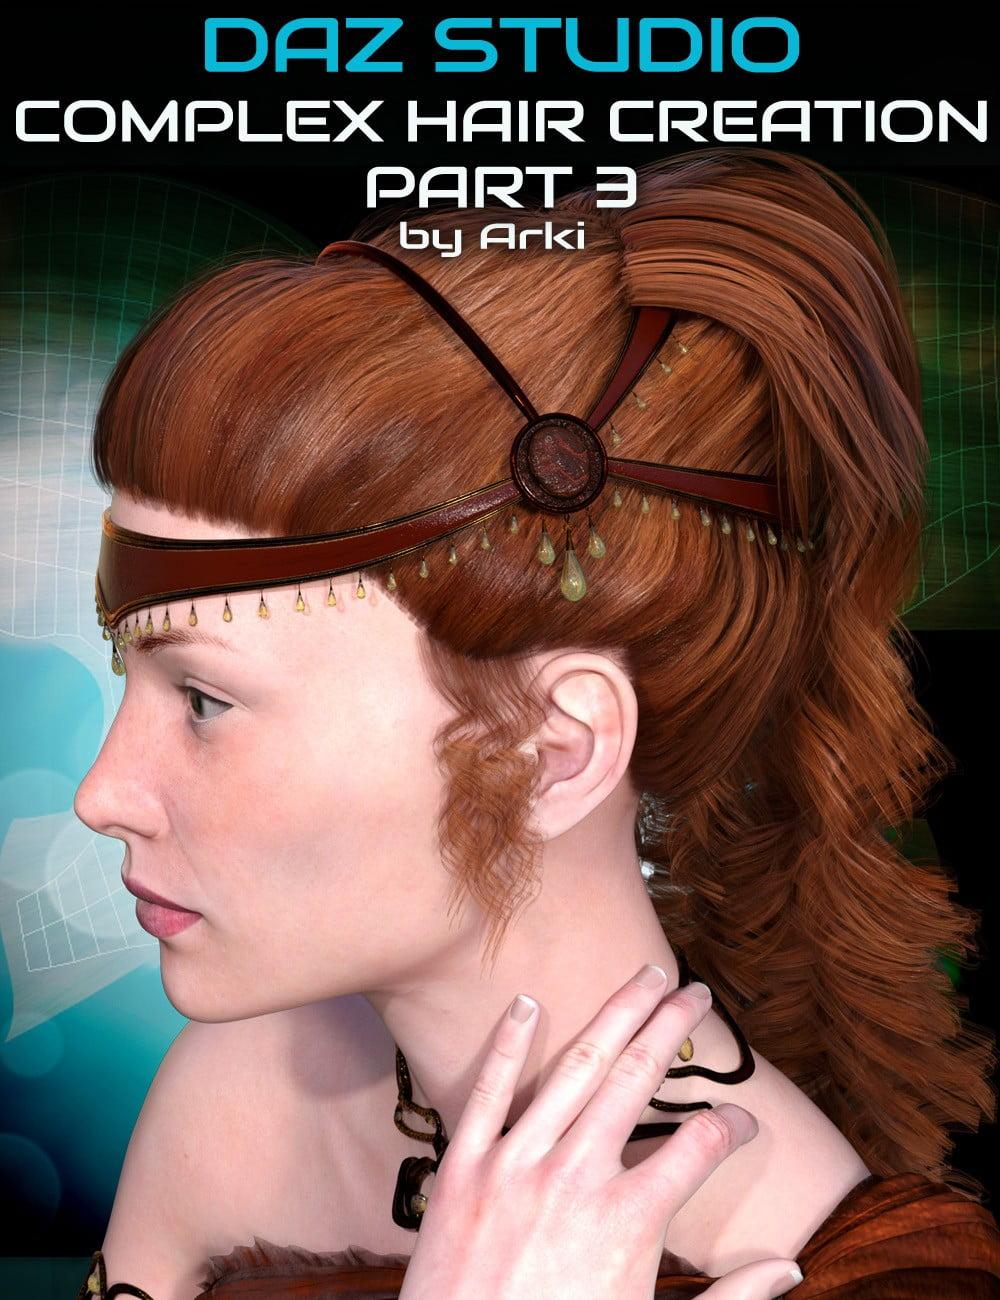 Complex Hair Creation Part 3: Texturing